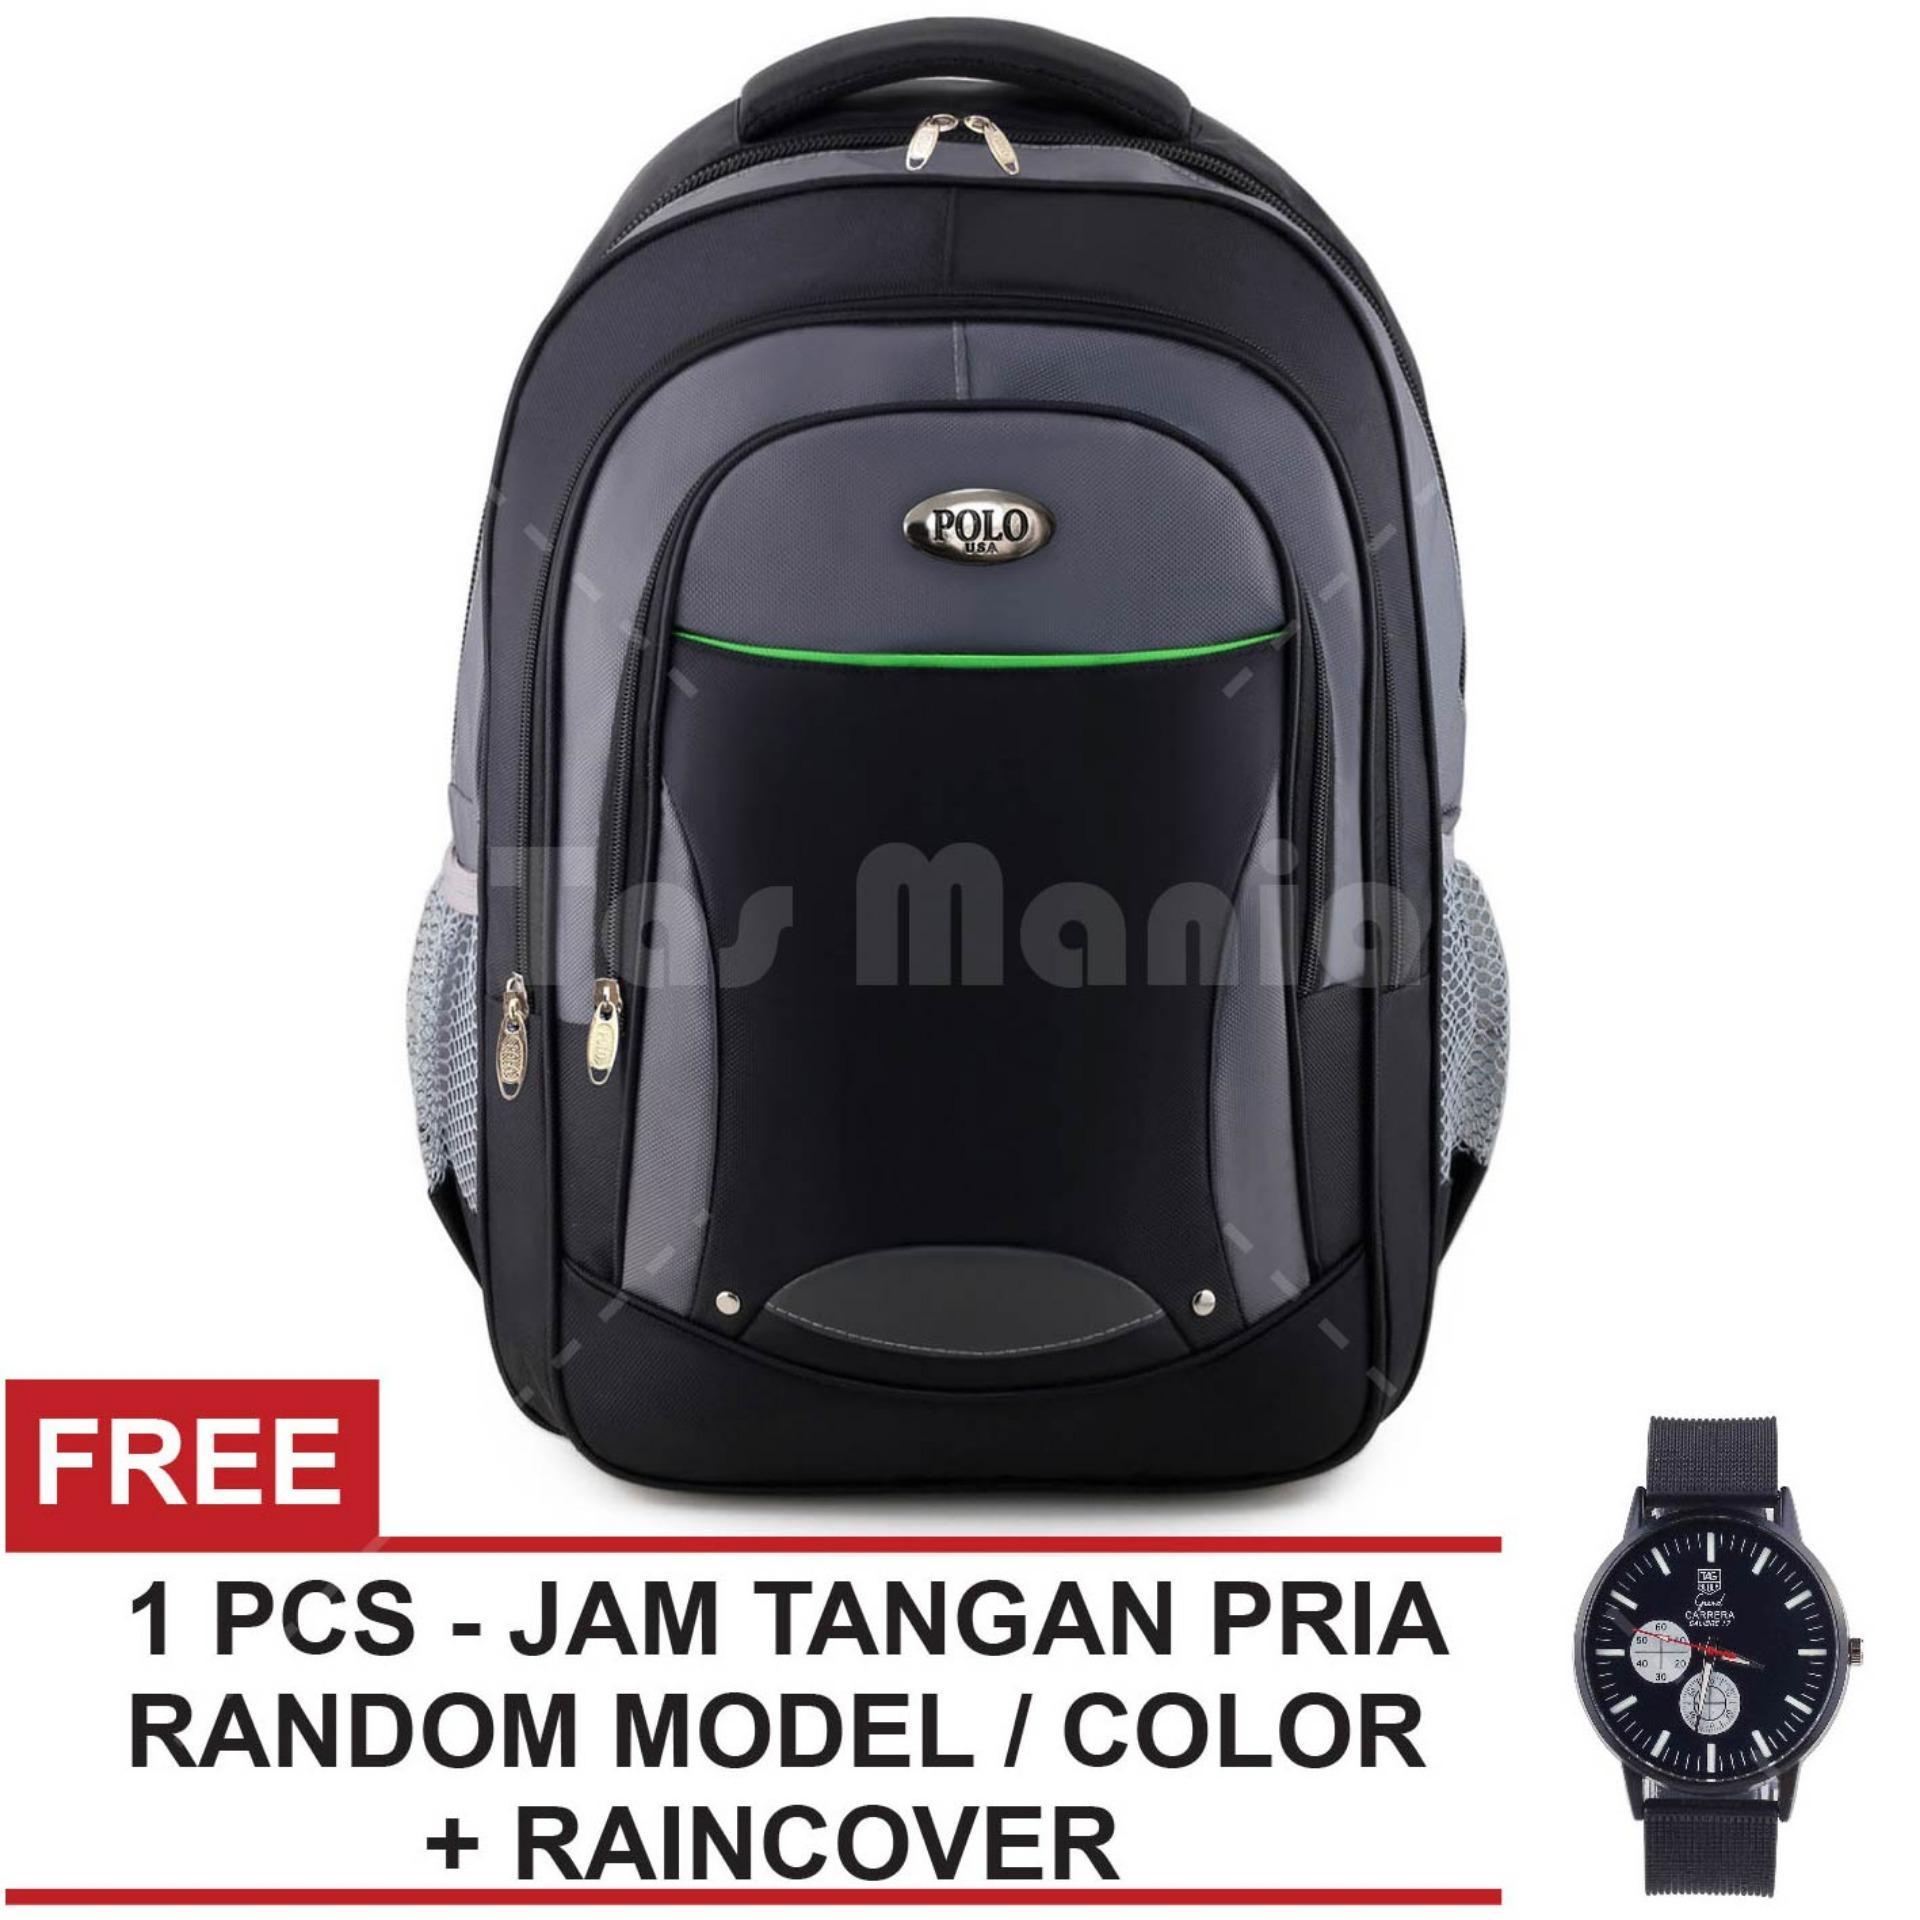 Promo Tas Ransel Polo Usa Sheldrake Dailypack Tas Laptop Casual Backpack Black Raincover Free Jam Tangan Pria Tas Pria Tas Kerja Tas Fashion Pria Di Jawa Barat